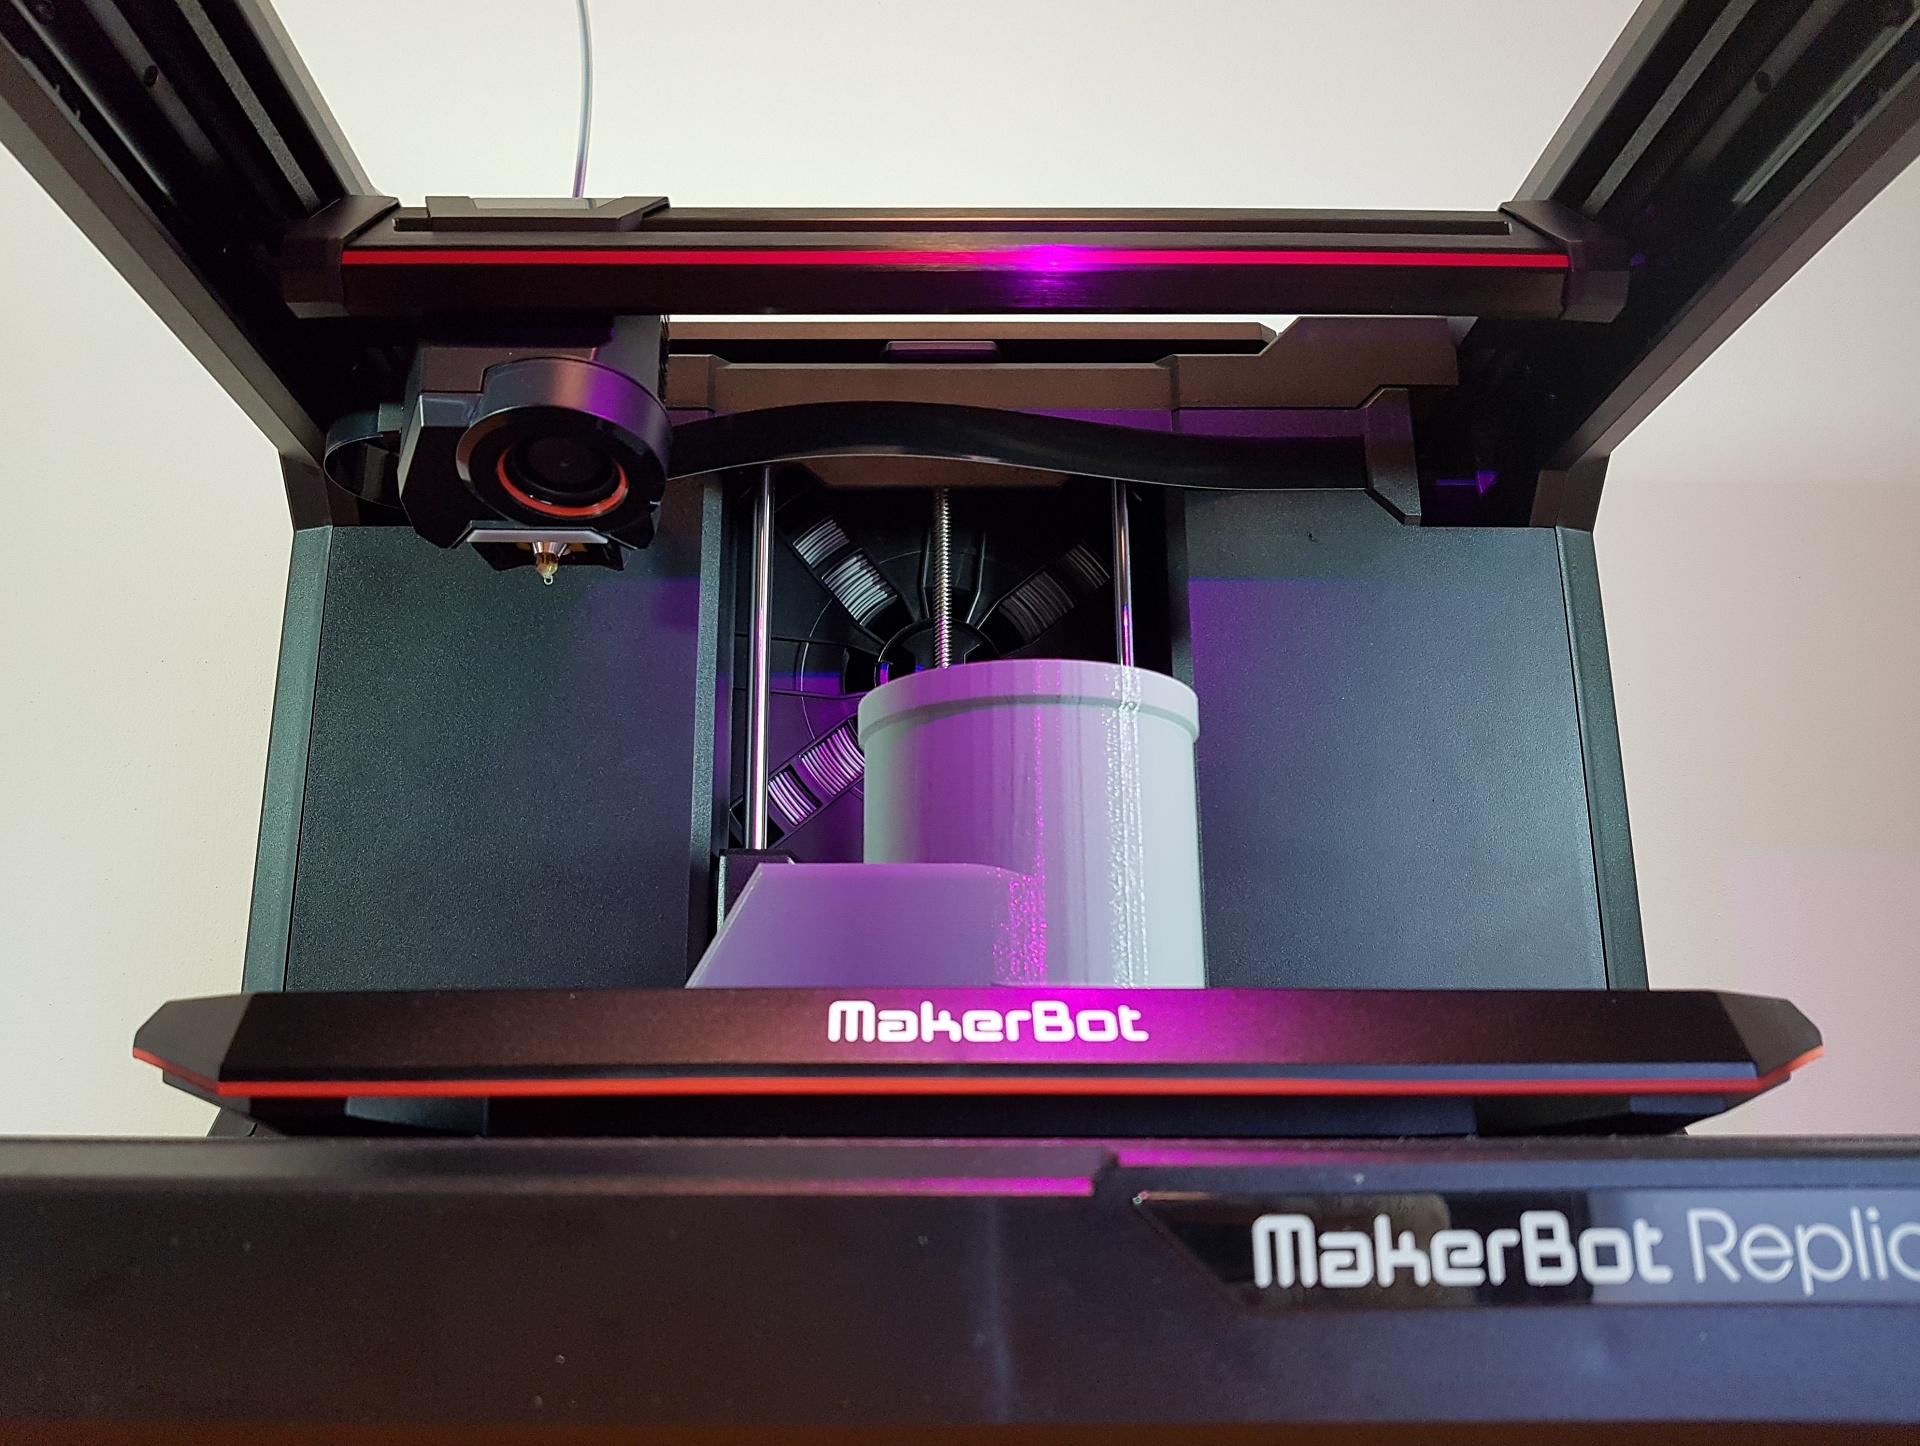 Recenze 3D tiskárny: Replicator+ oslovuje konstruktéry